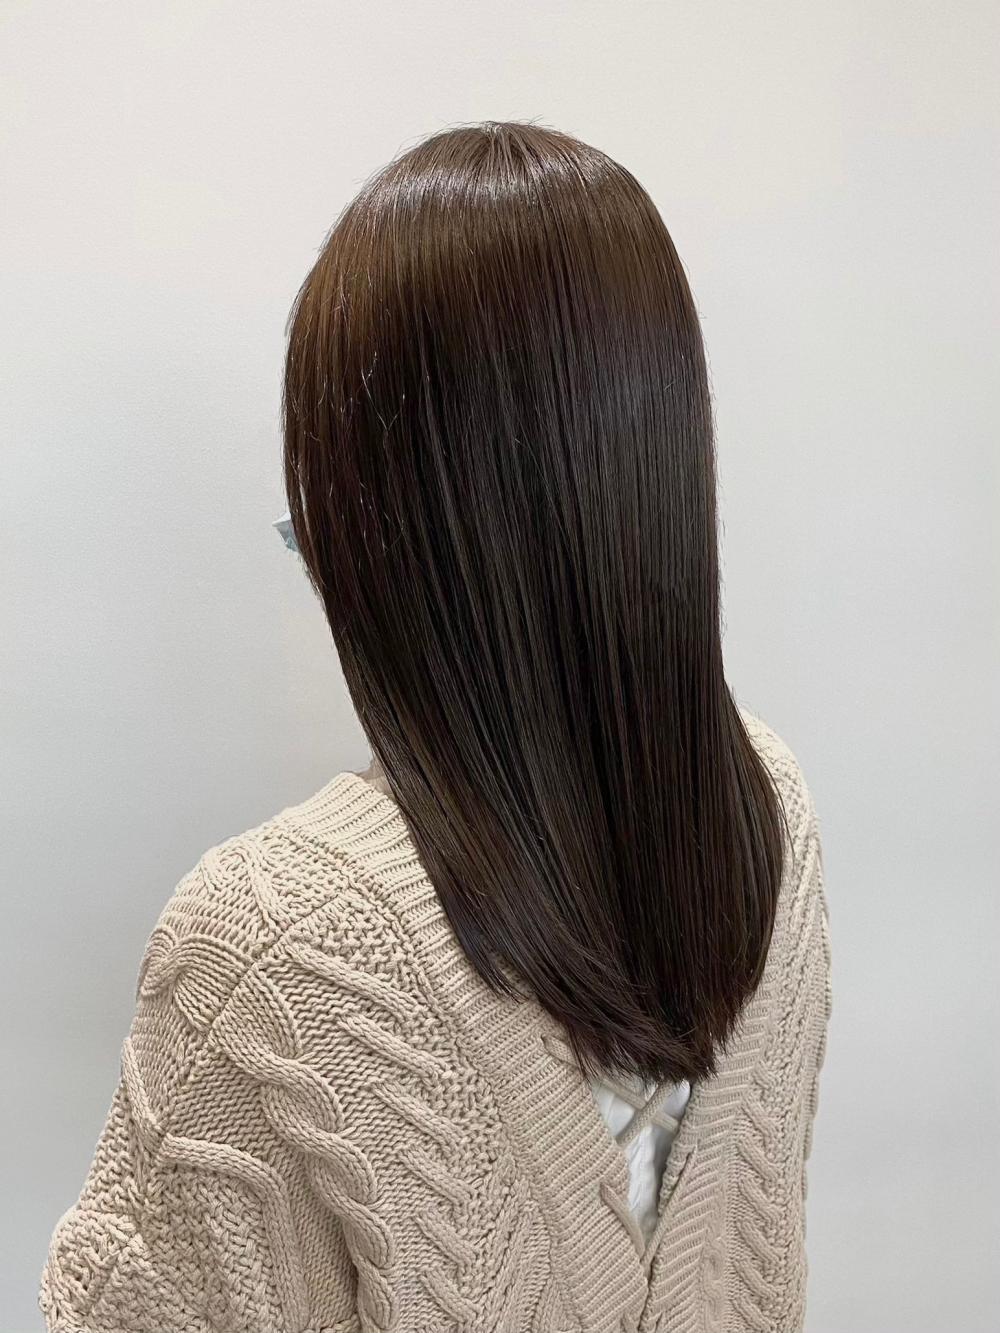 【feliceMICHI間嶋健司】ツヤサラ髪質改善トリートメント